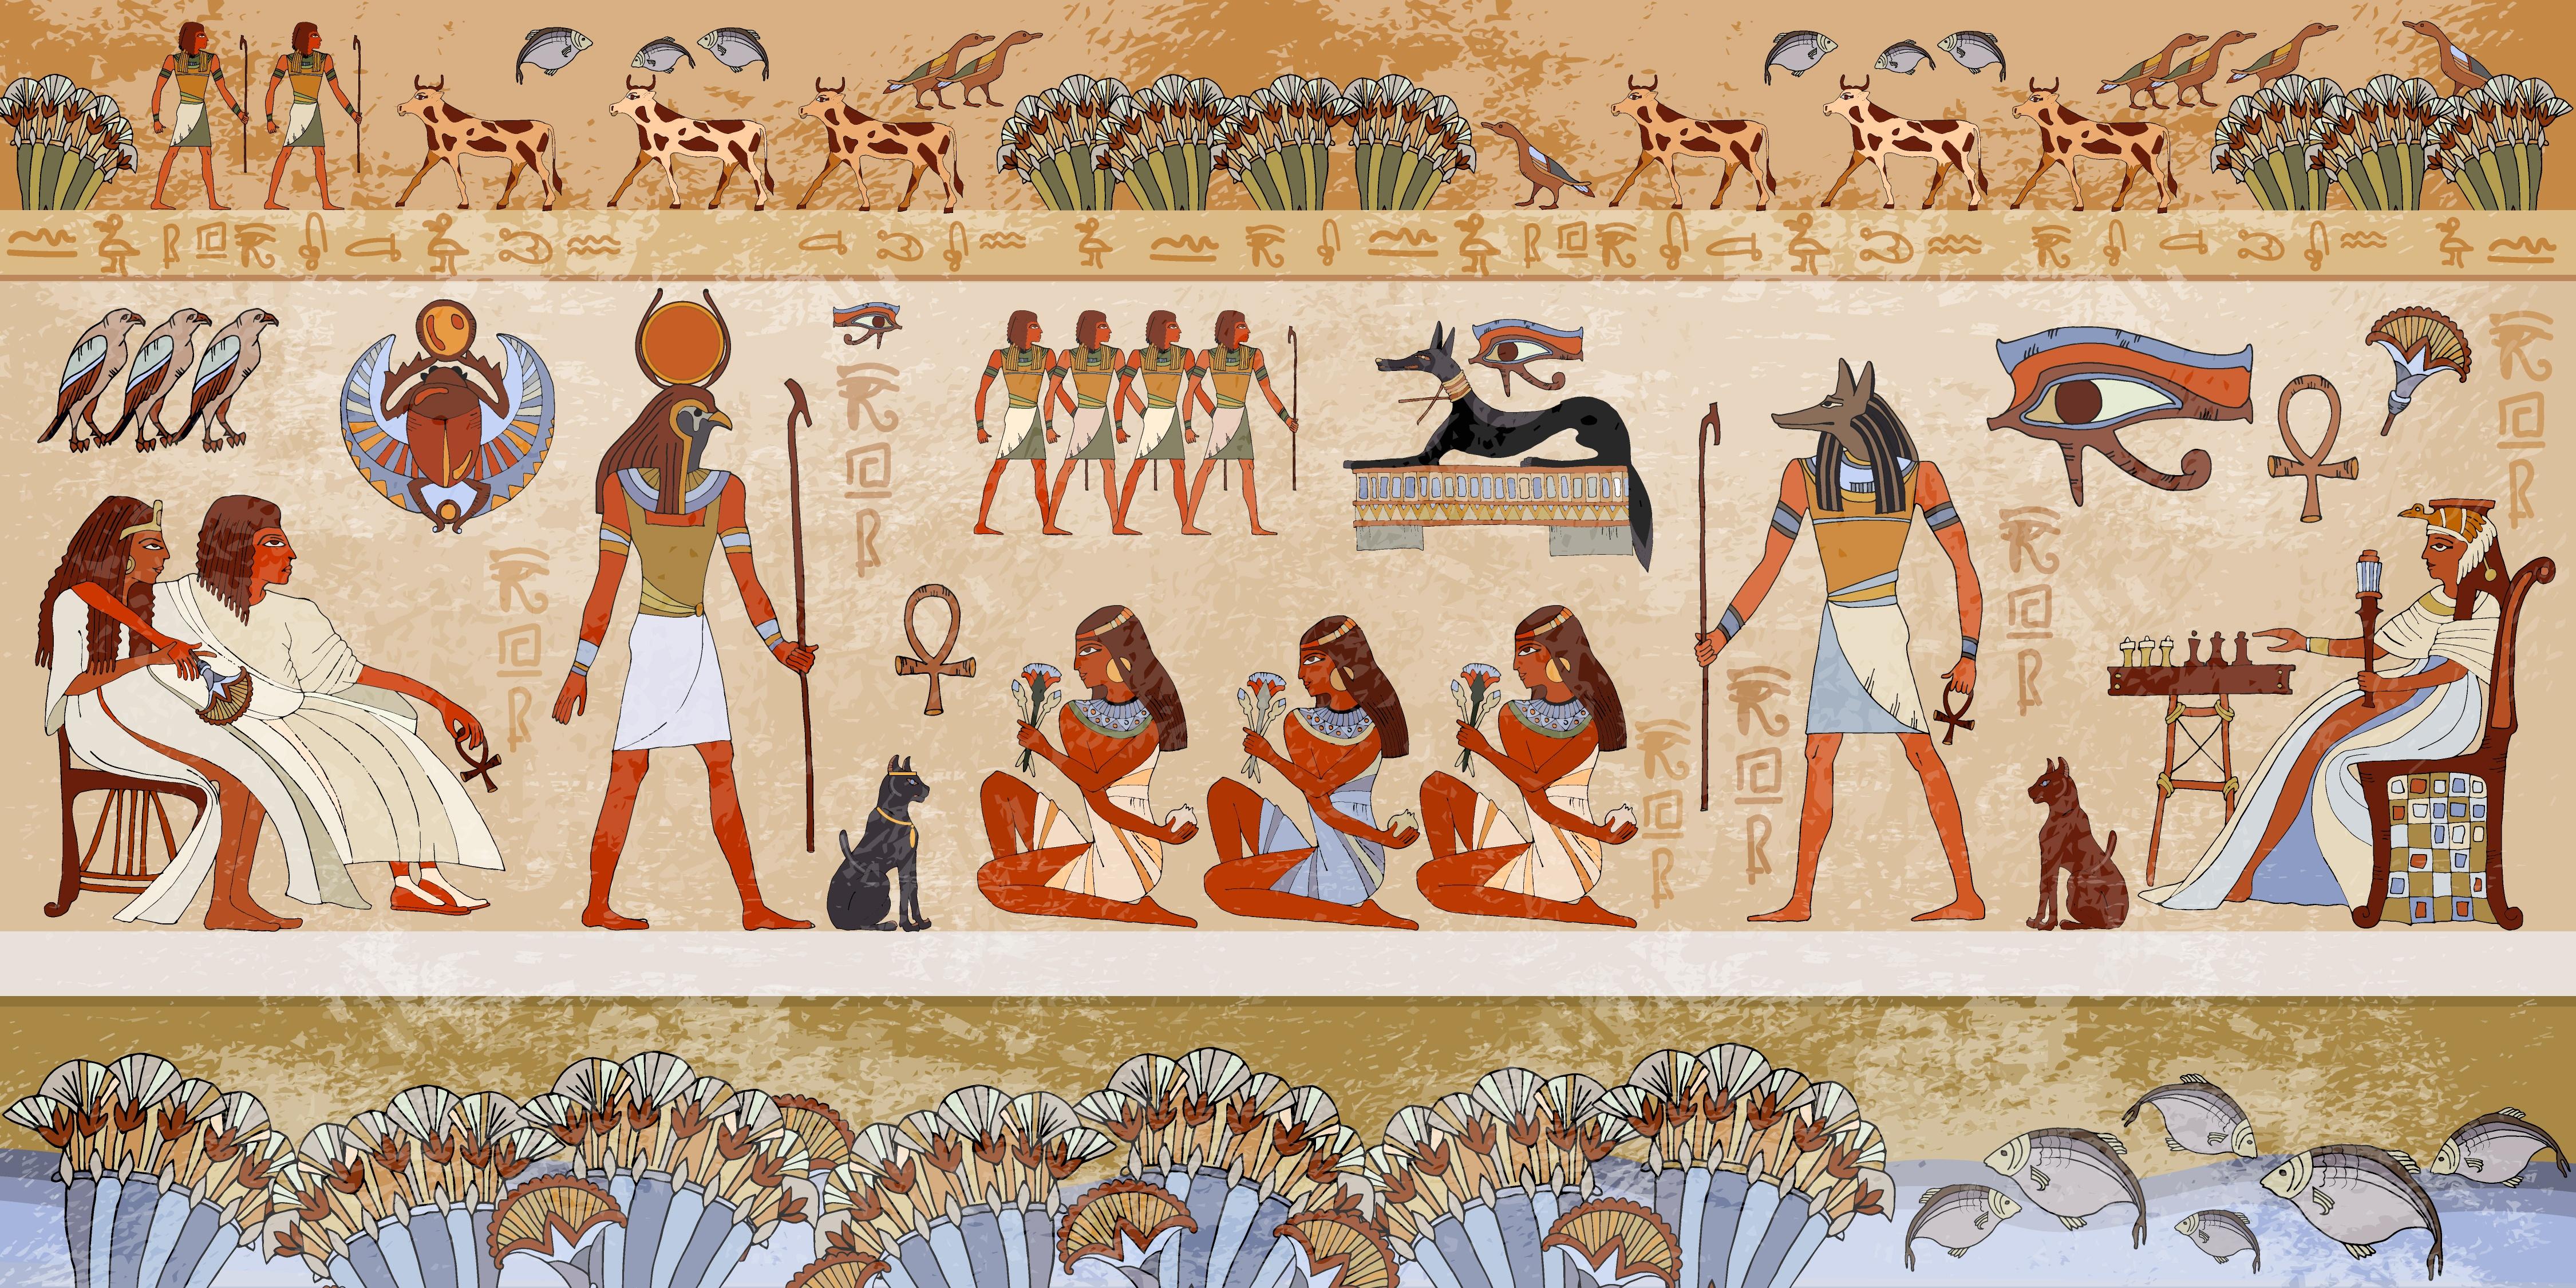 egyptian-symbols-mythology-ss_520864489.jpeg